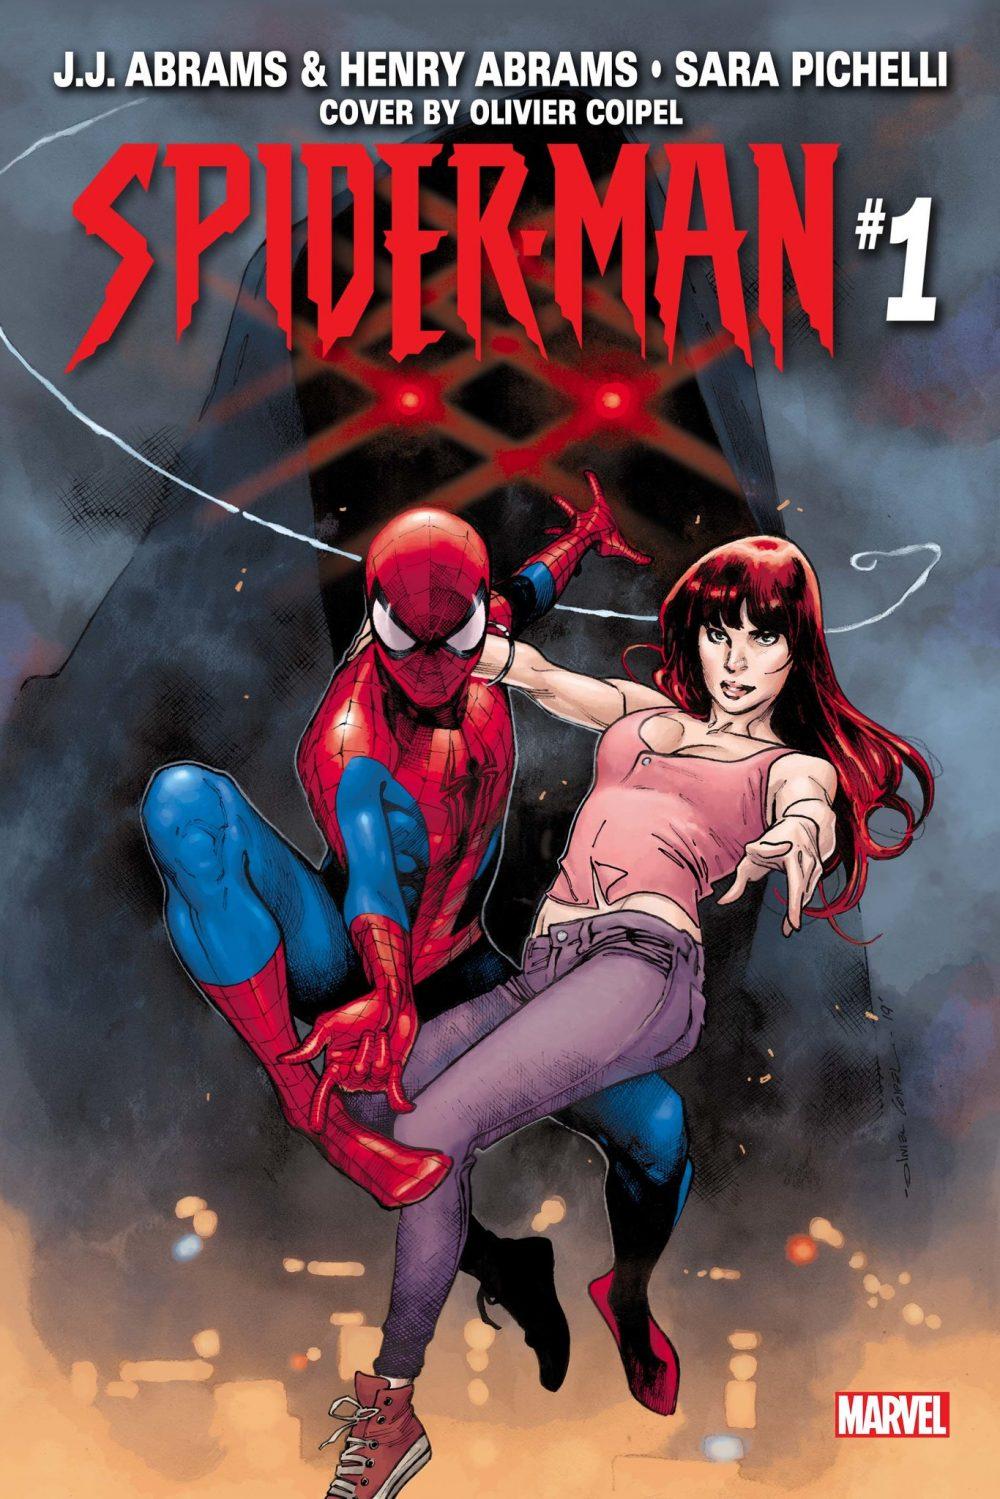 Spider-Man #1, copertina di Olivier Coipel